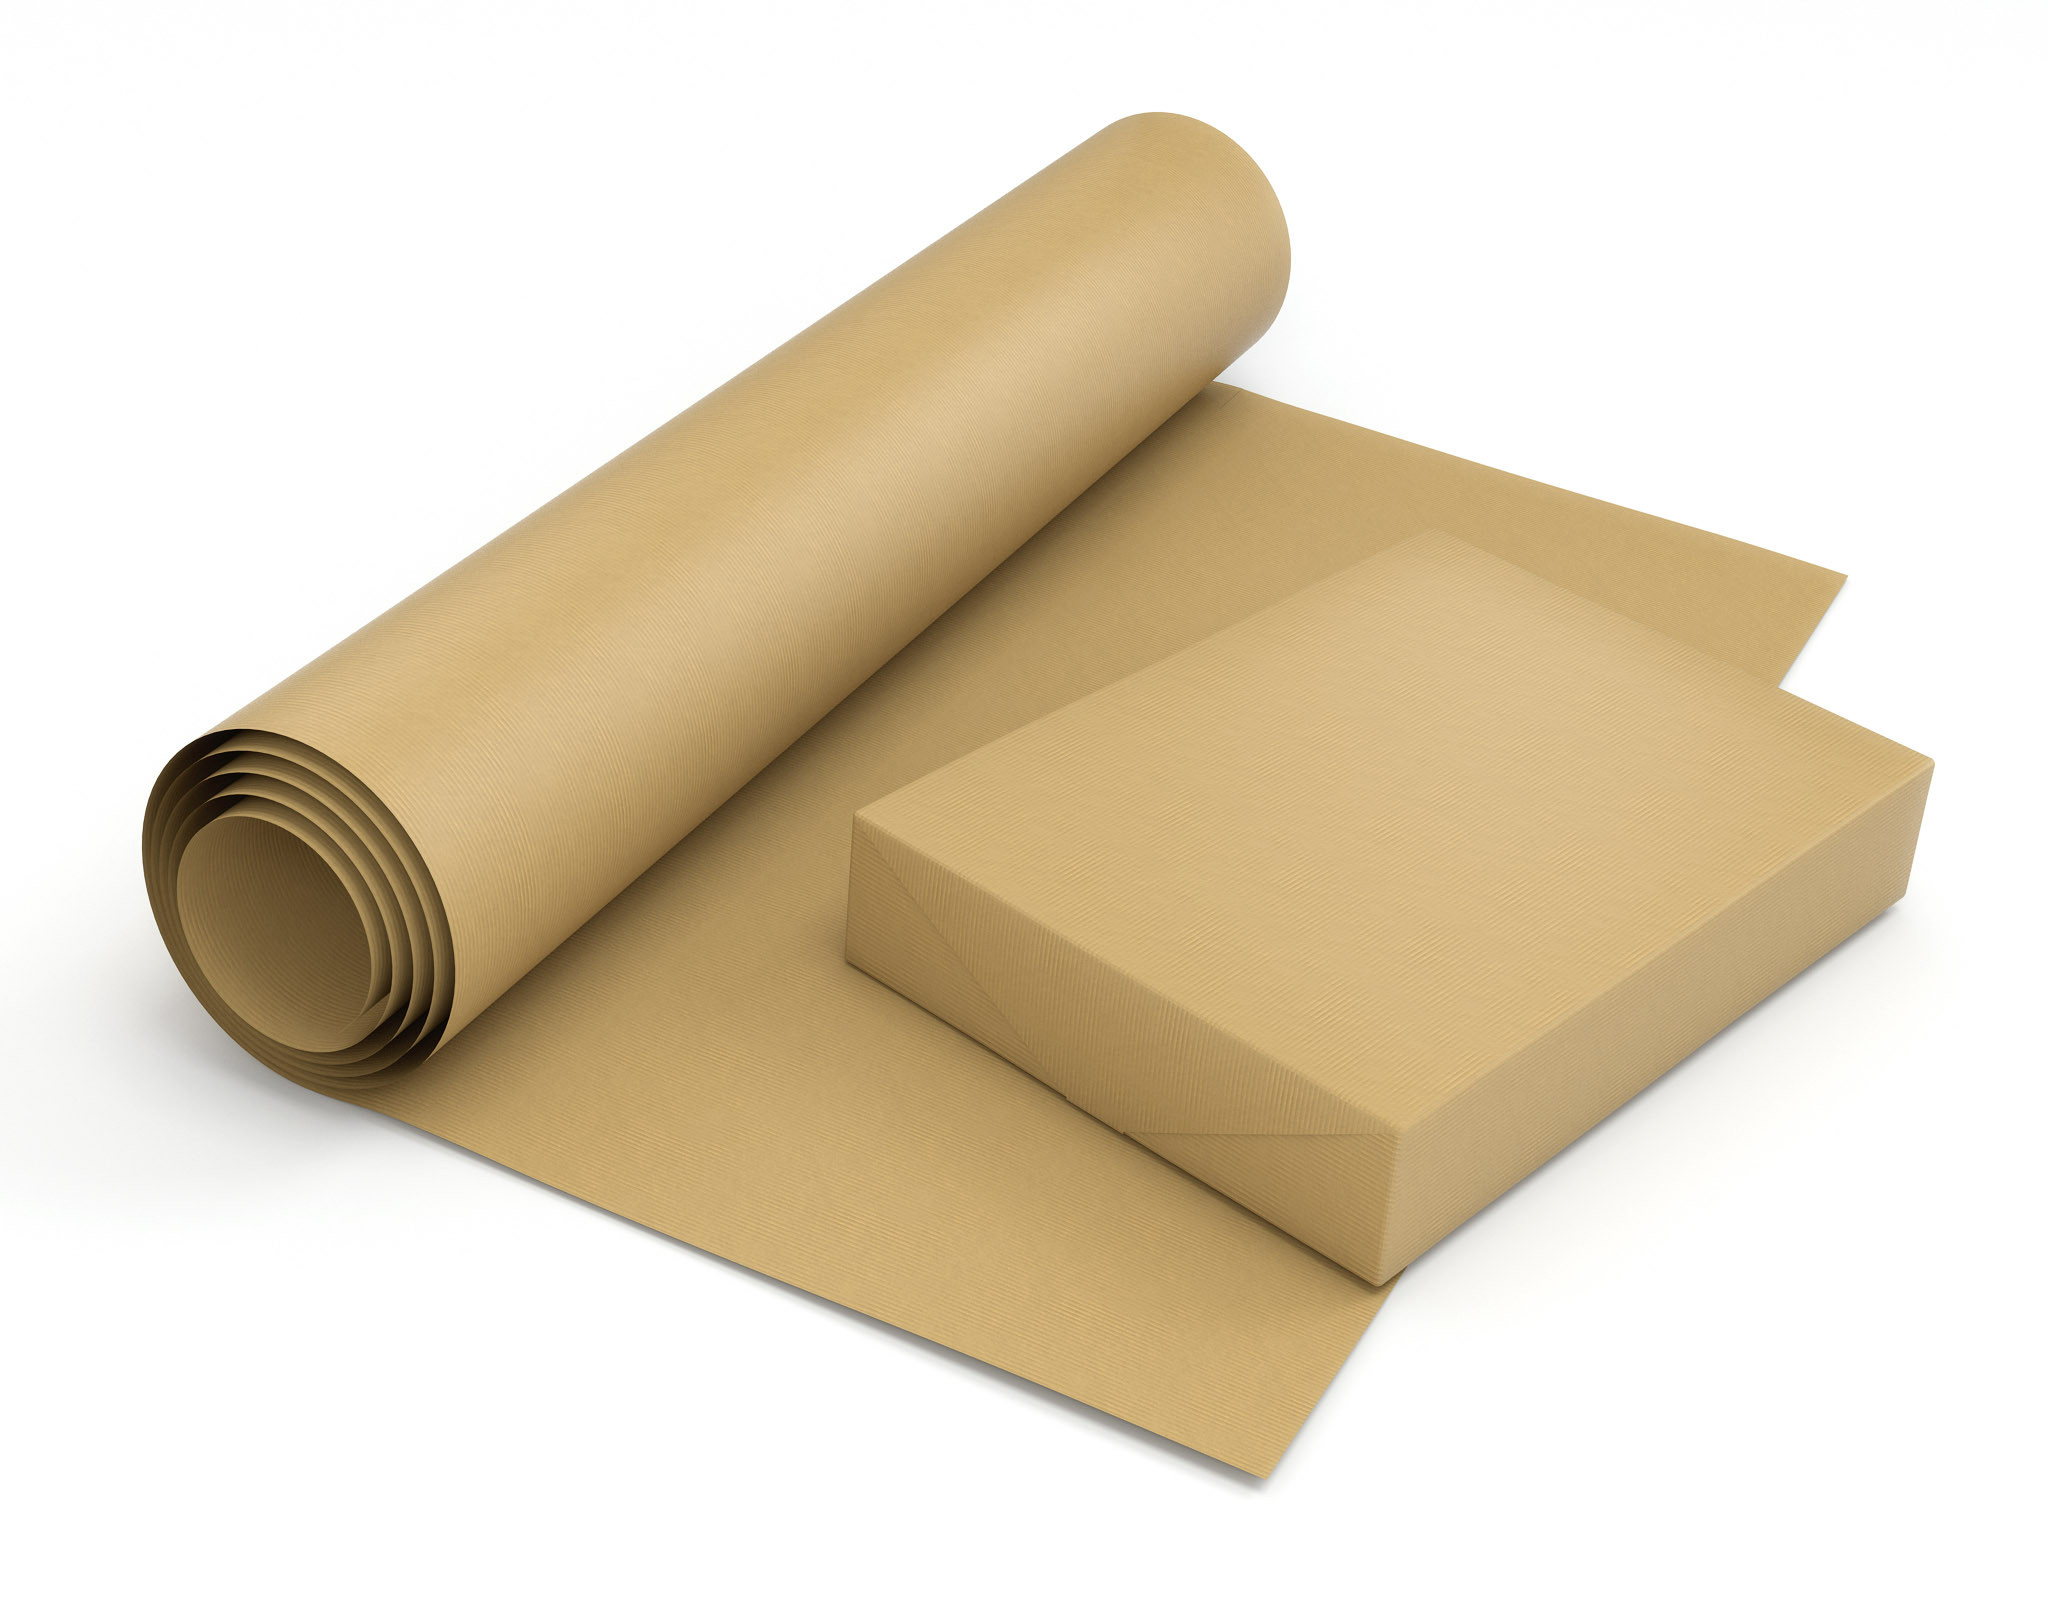 Крафт-бумага / упаковка